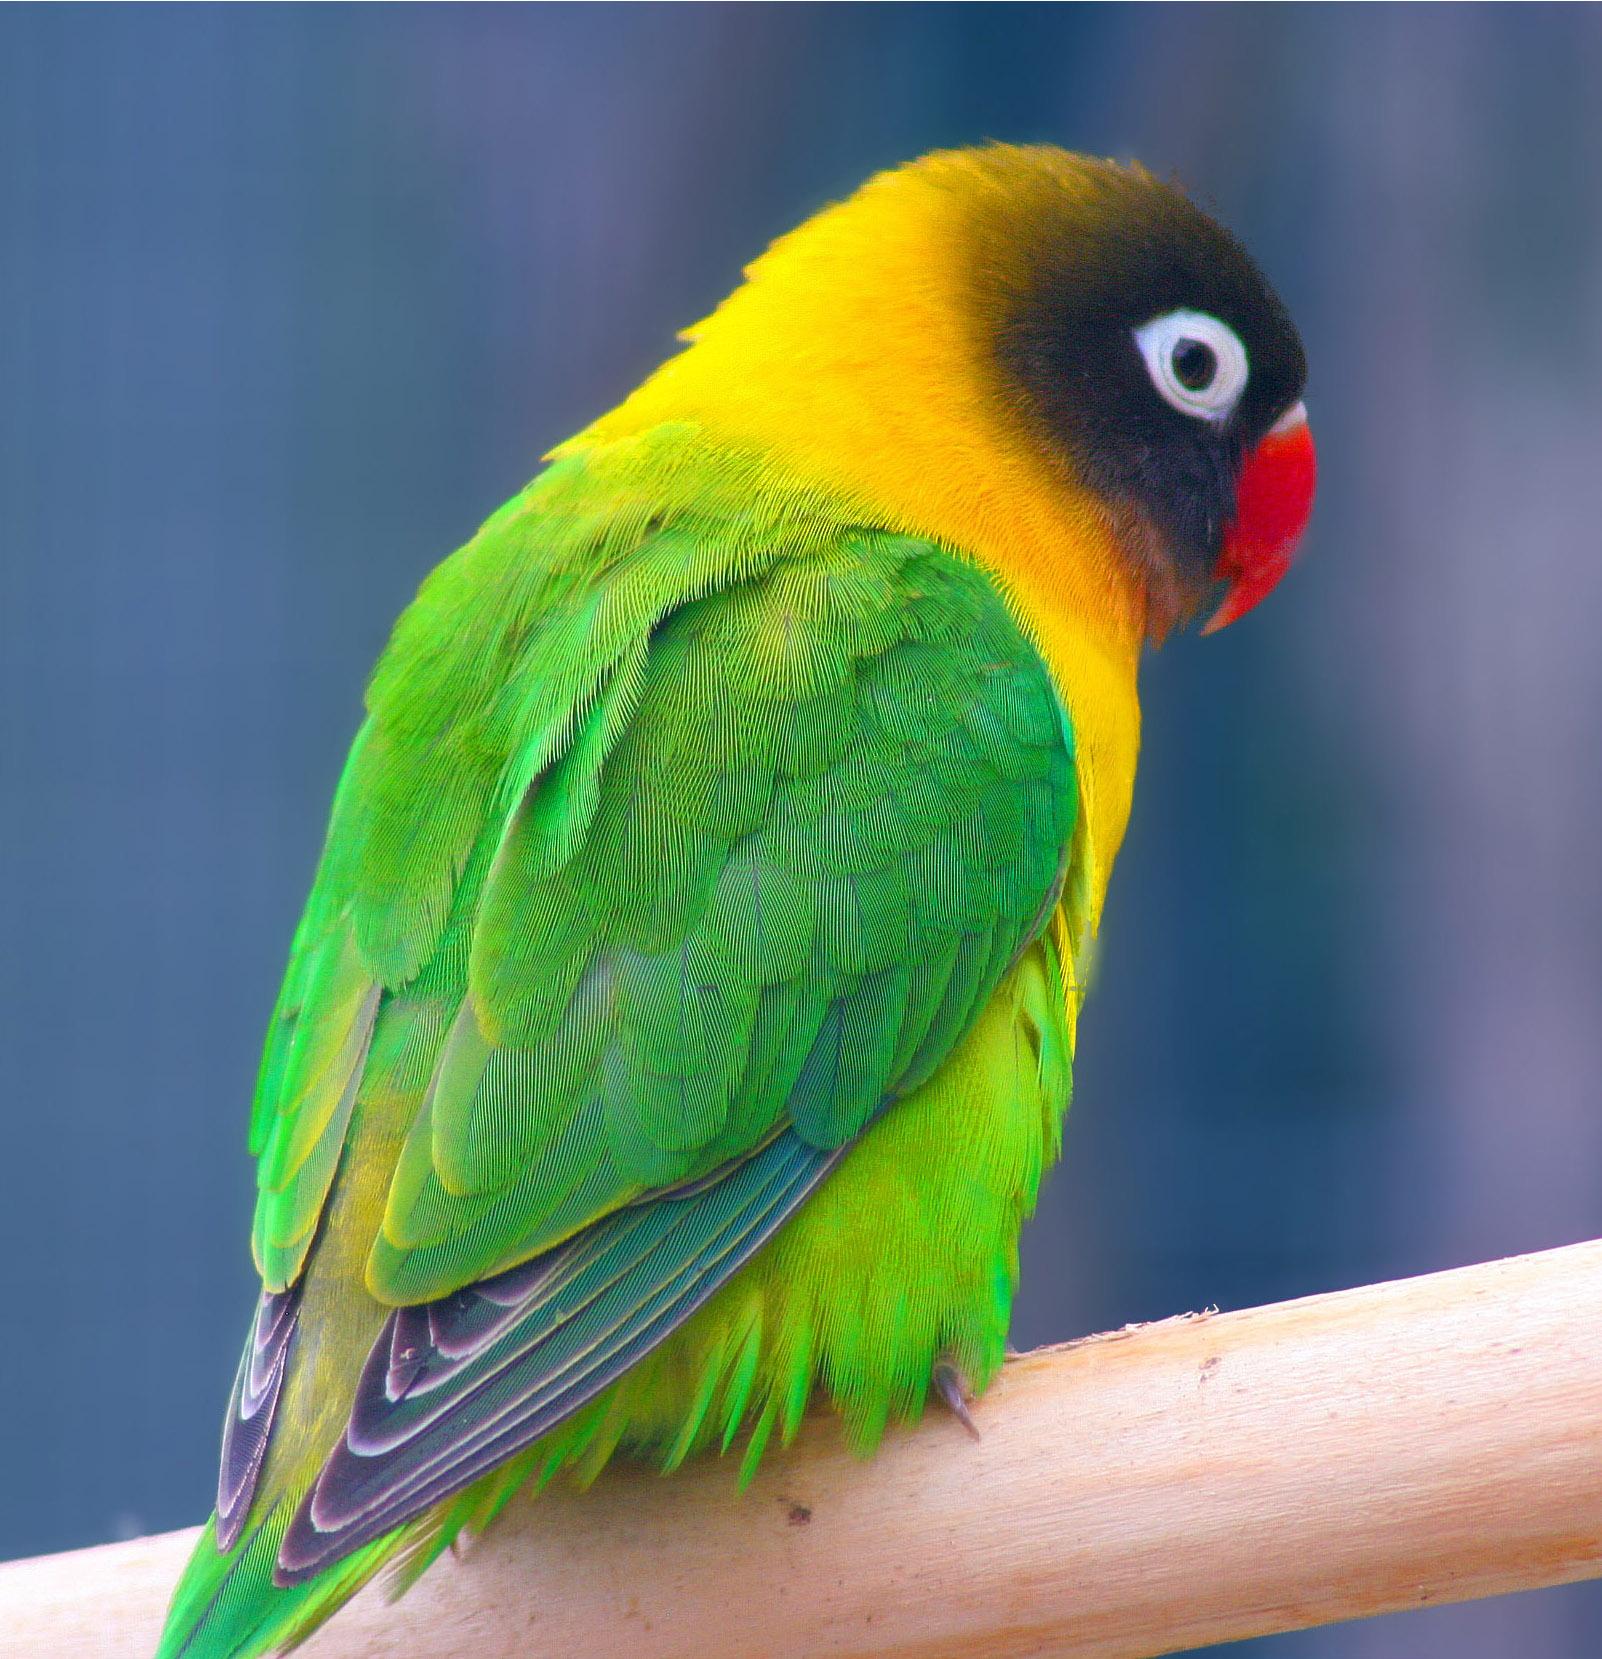 Yellow-collared lovebird - Wikipedia, the free encyclopedia